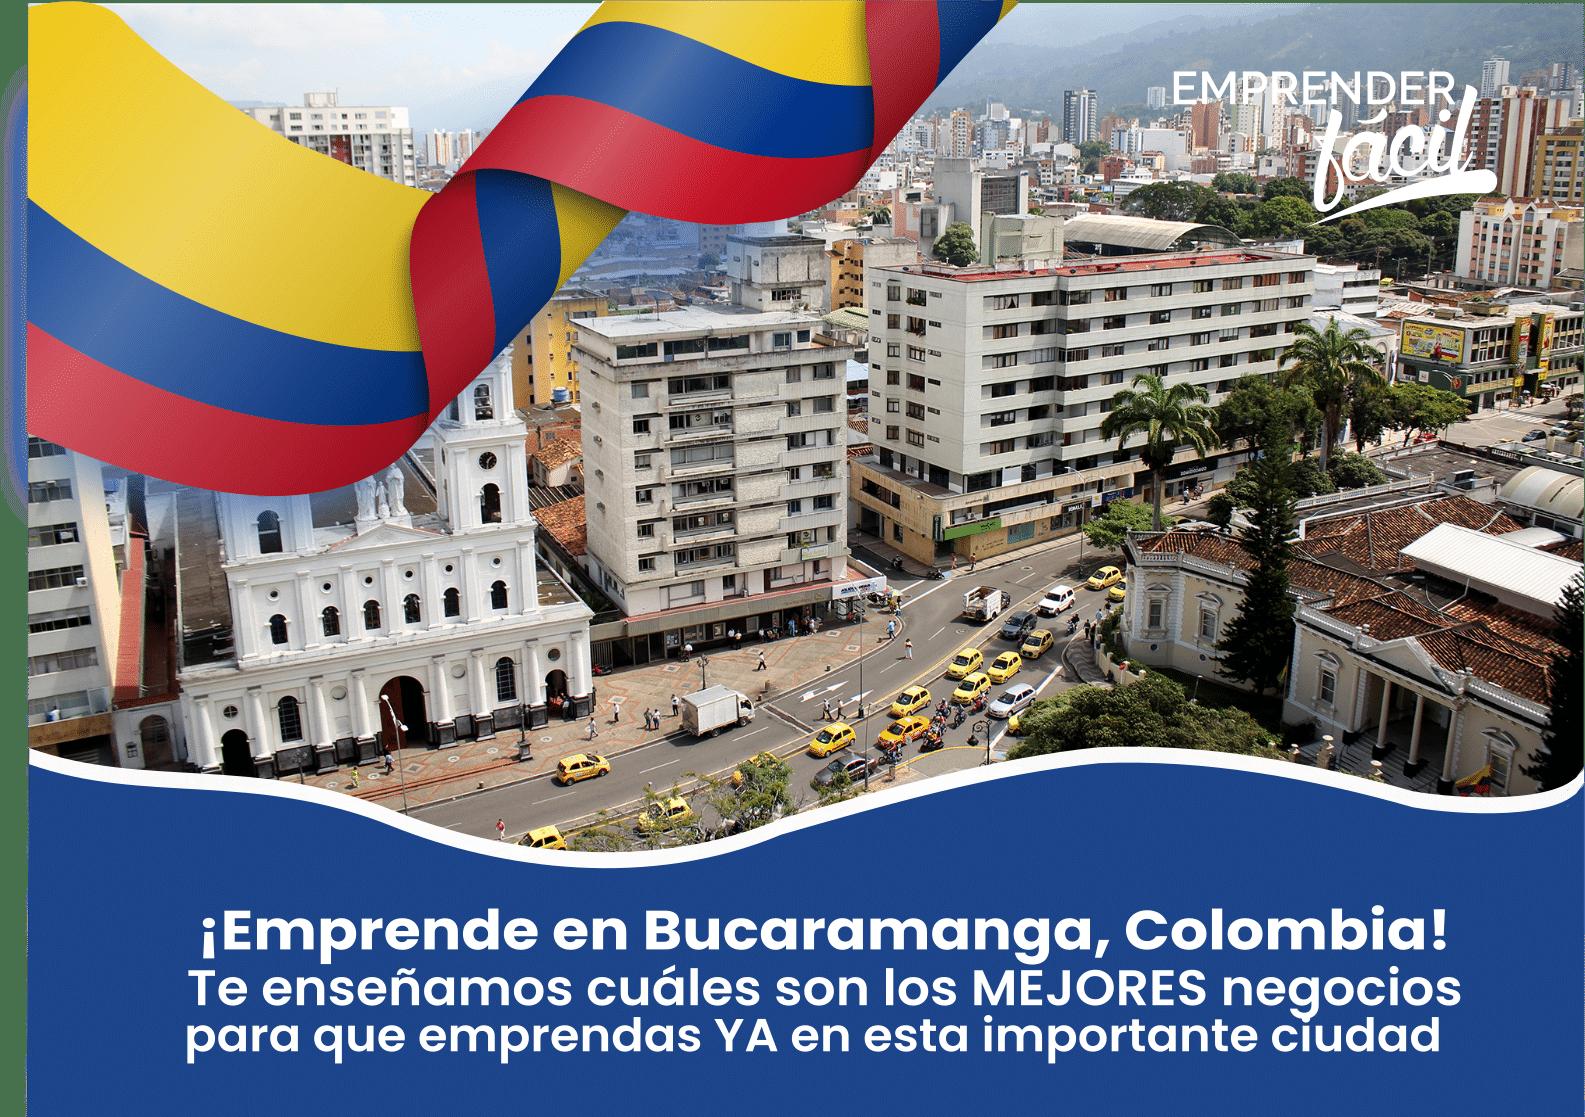 Negocios Rentables en Bucaramanga, Colombia ¡Efectivos!